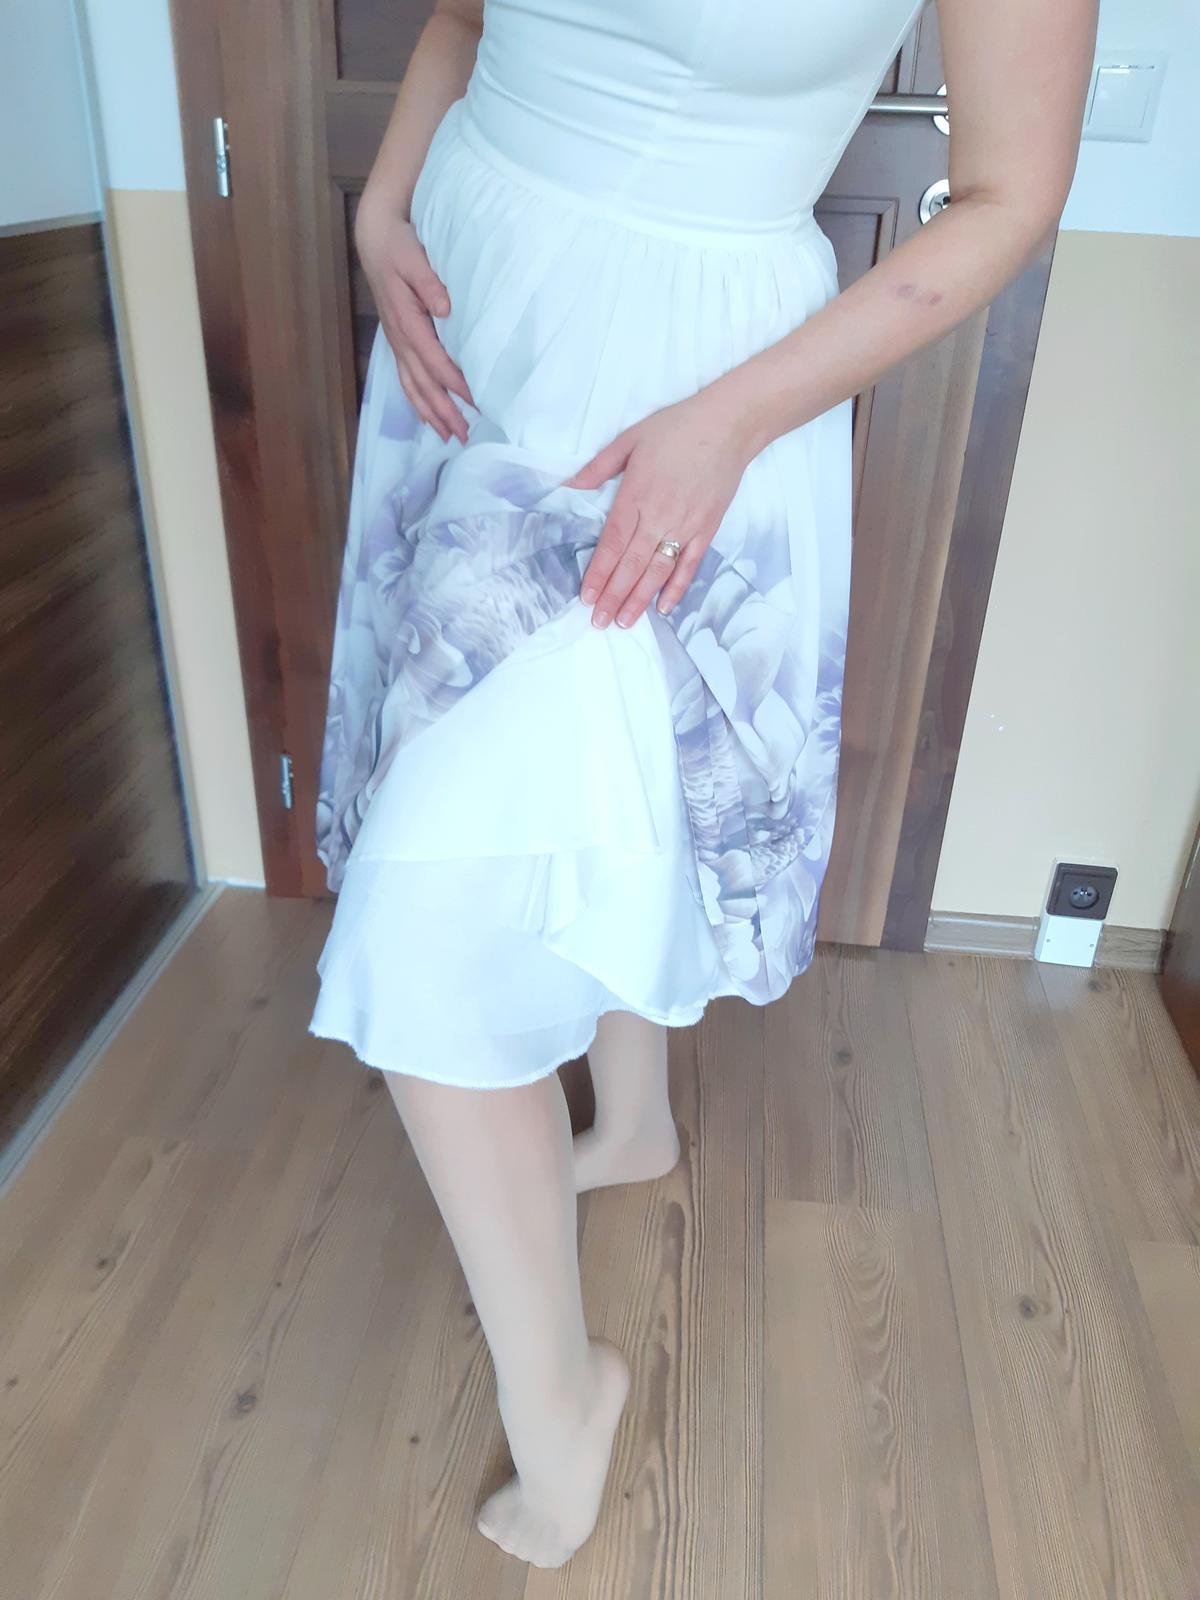 Biele šaty s fialkovými kvetmi - Obrázok č. 3